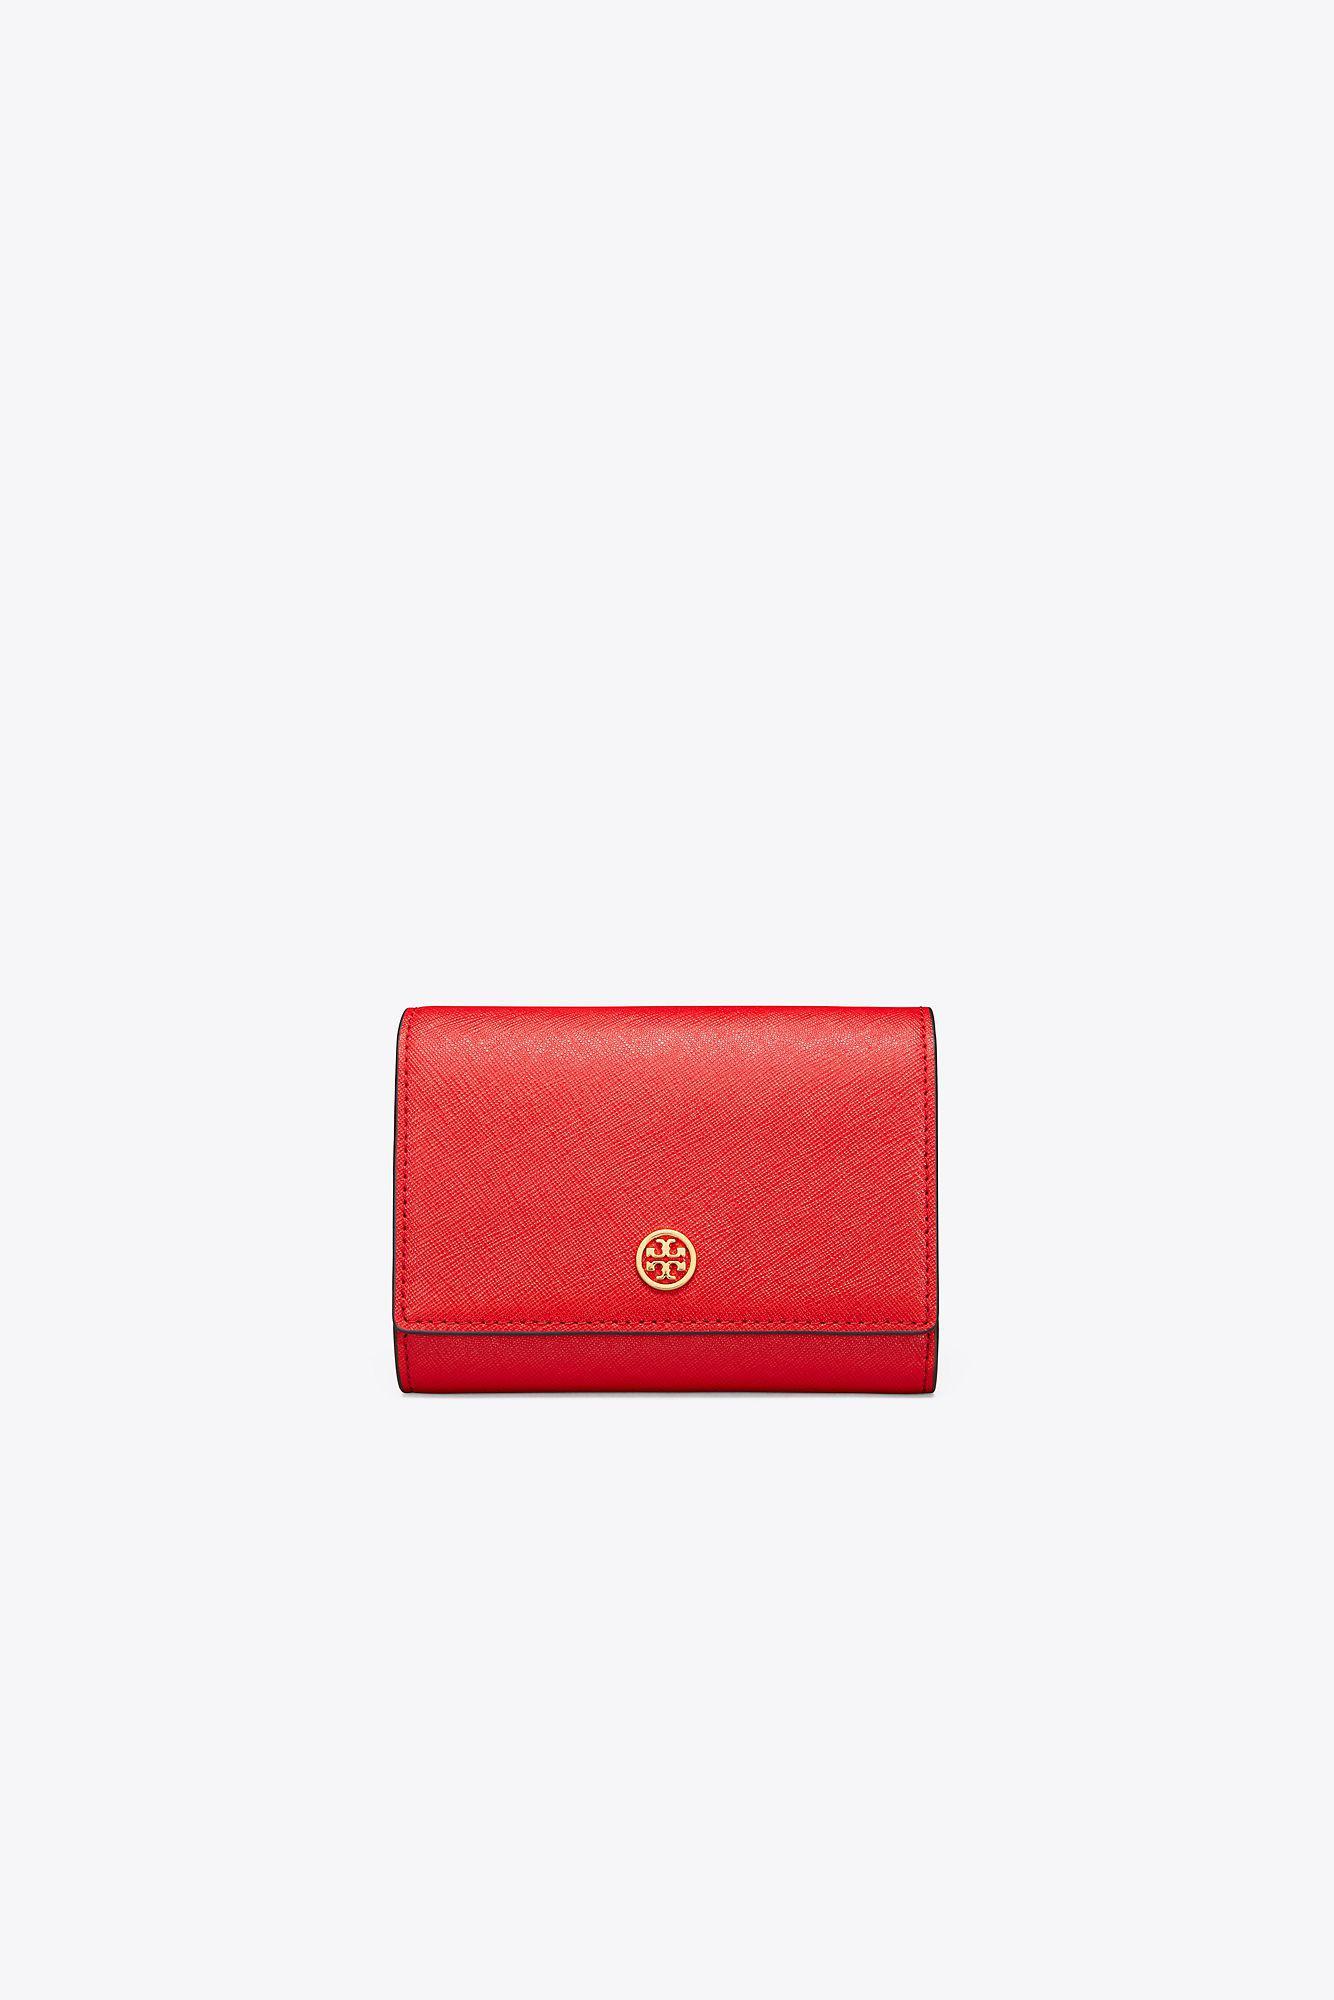 3d91f149a12e Lyst - Tory Burch Robinson Medium Wallet in Red